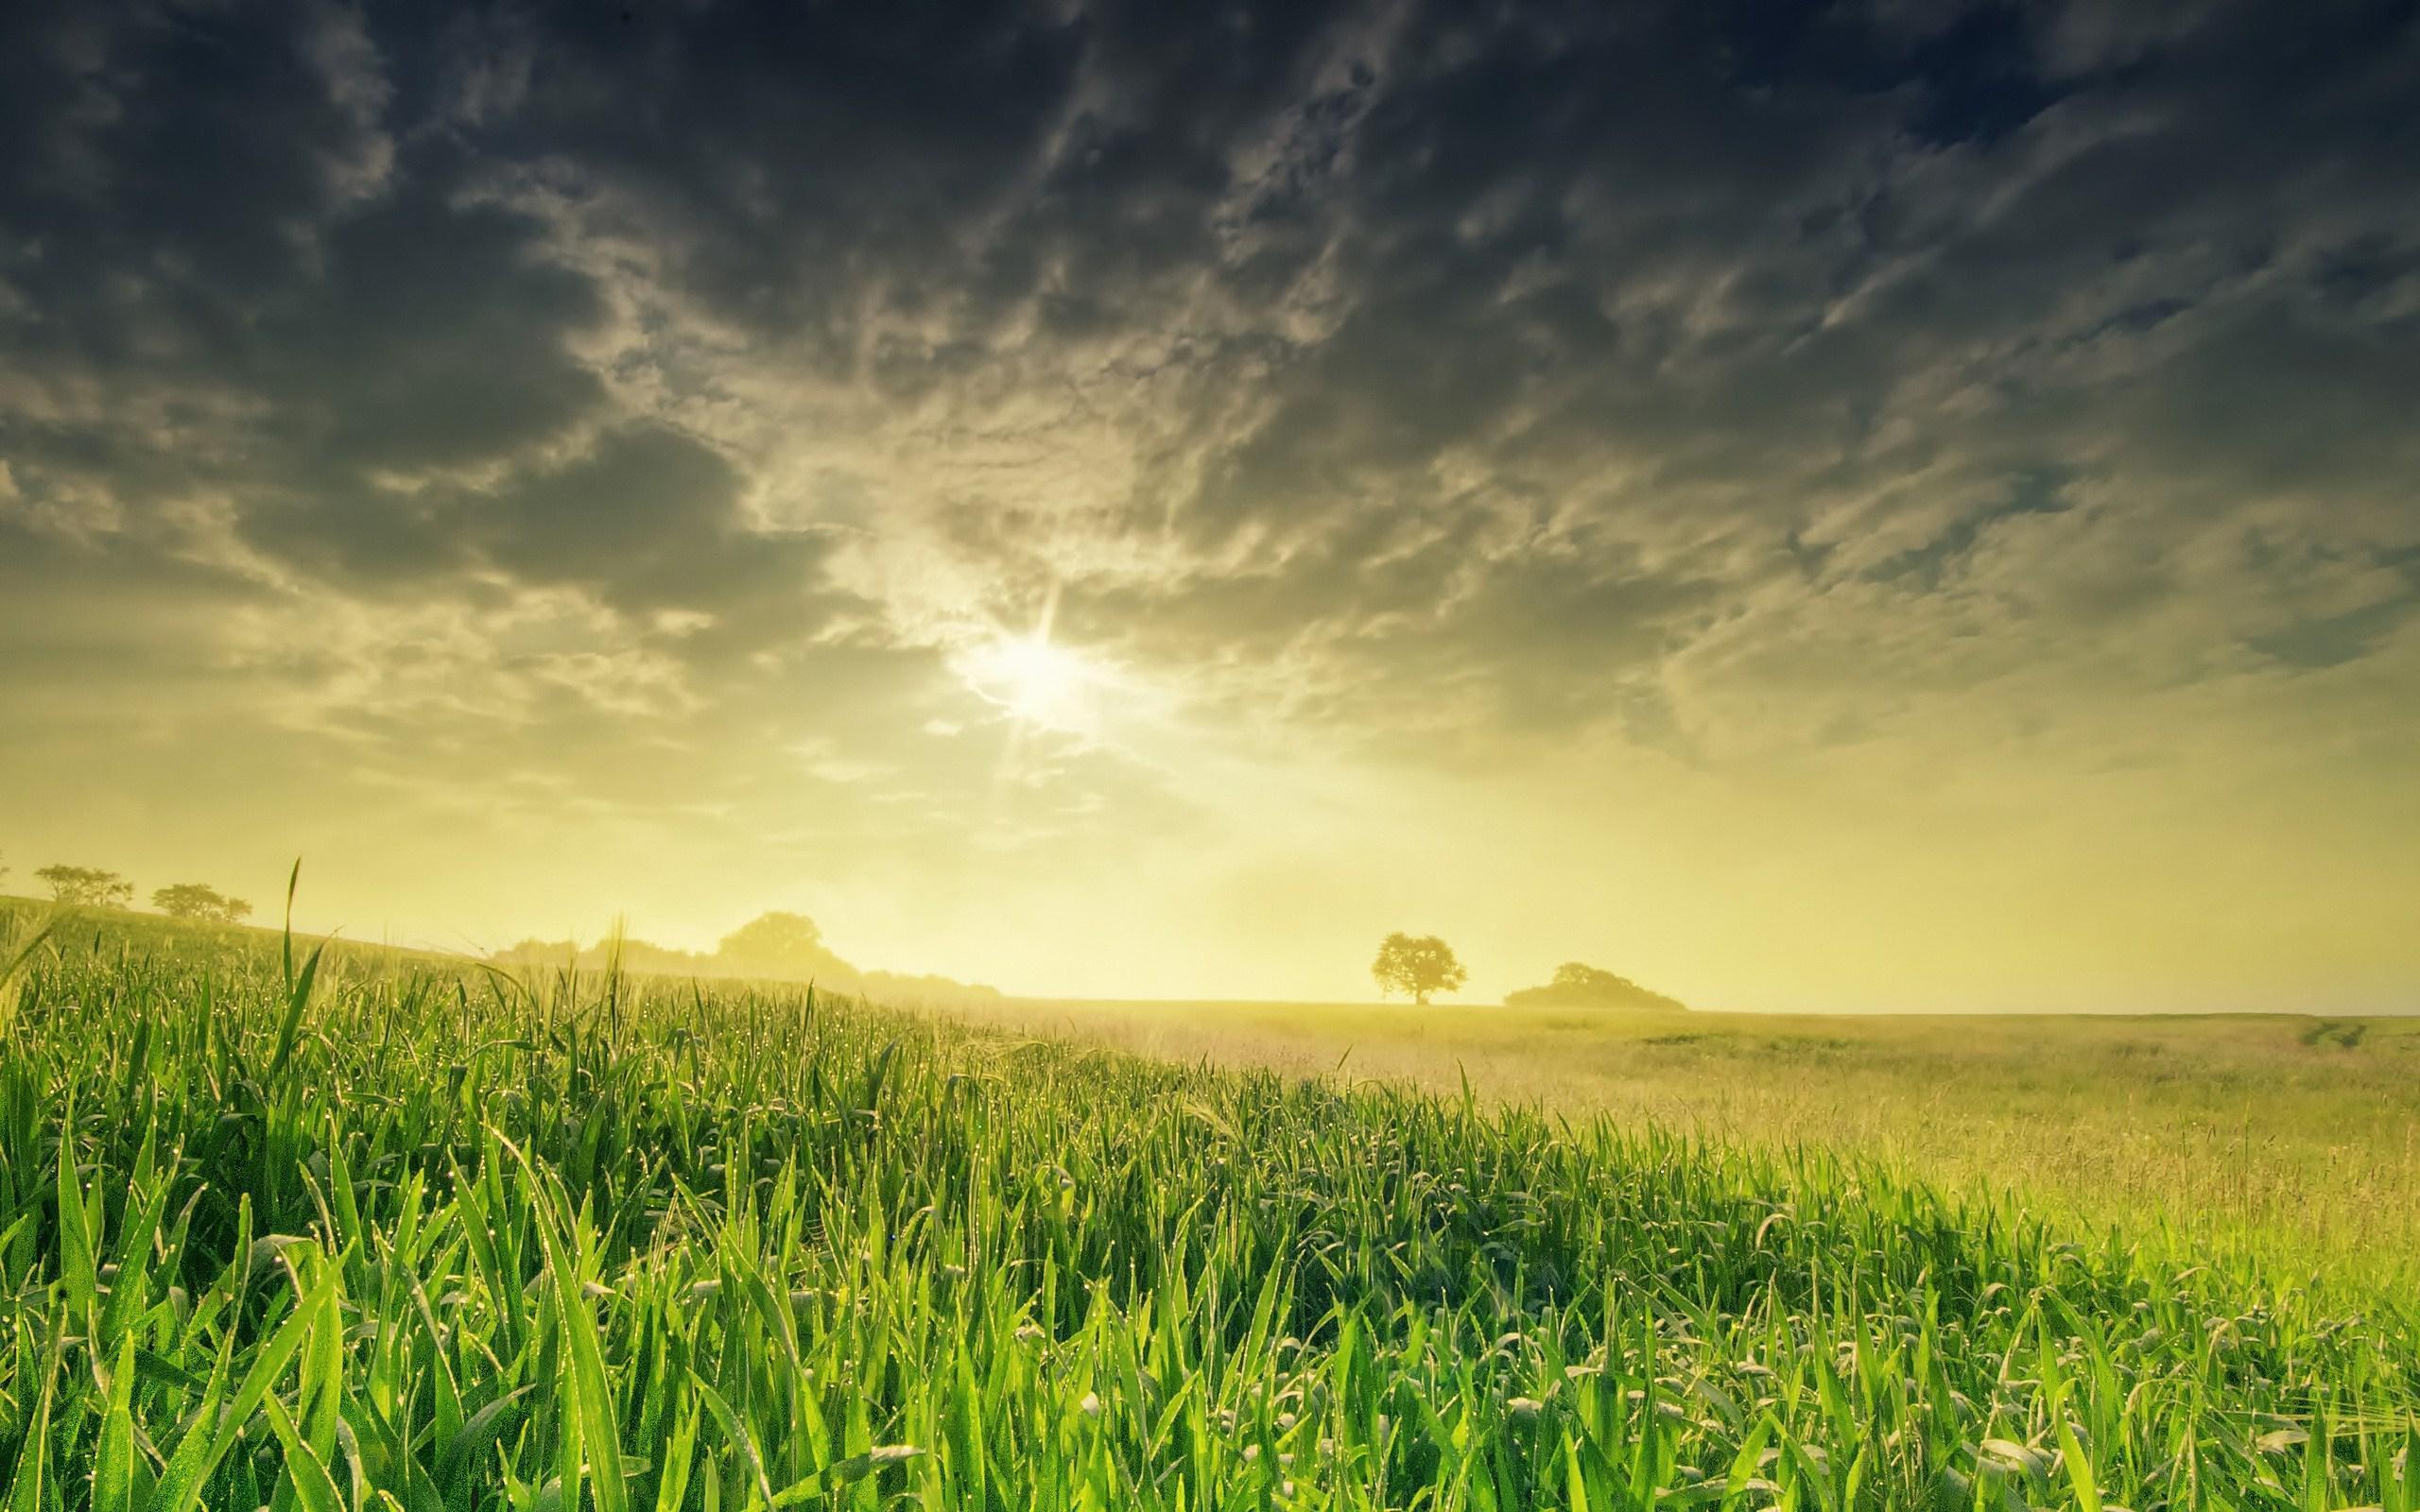 Best 3d Animated Wallpapers For Android Nature Landscape Field Sun Grass Best Hd Desktop Wallpaper